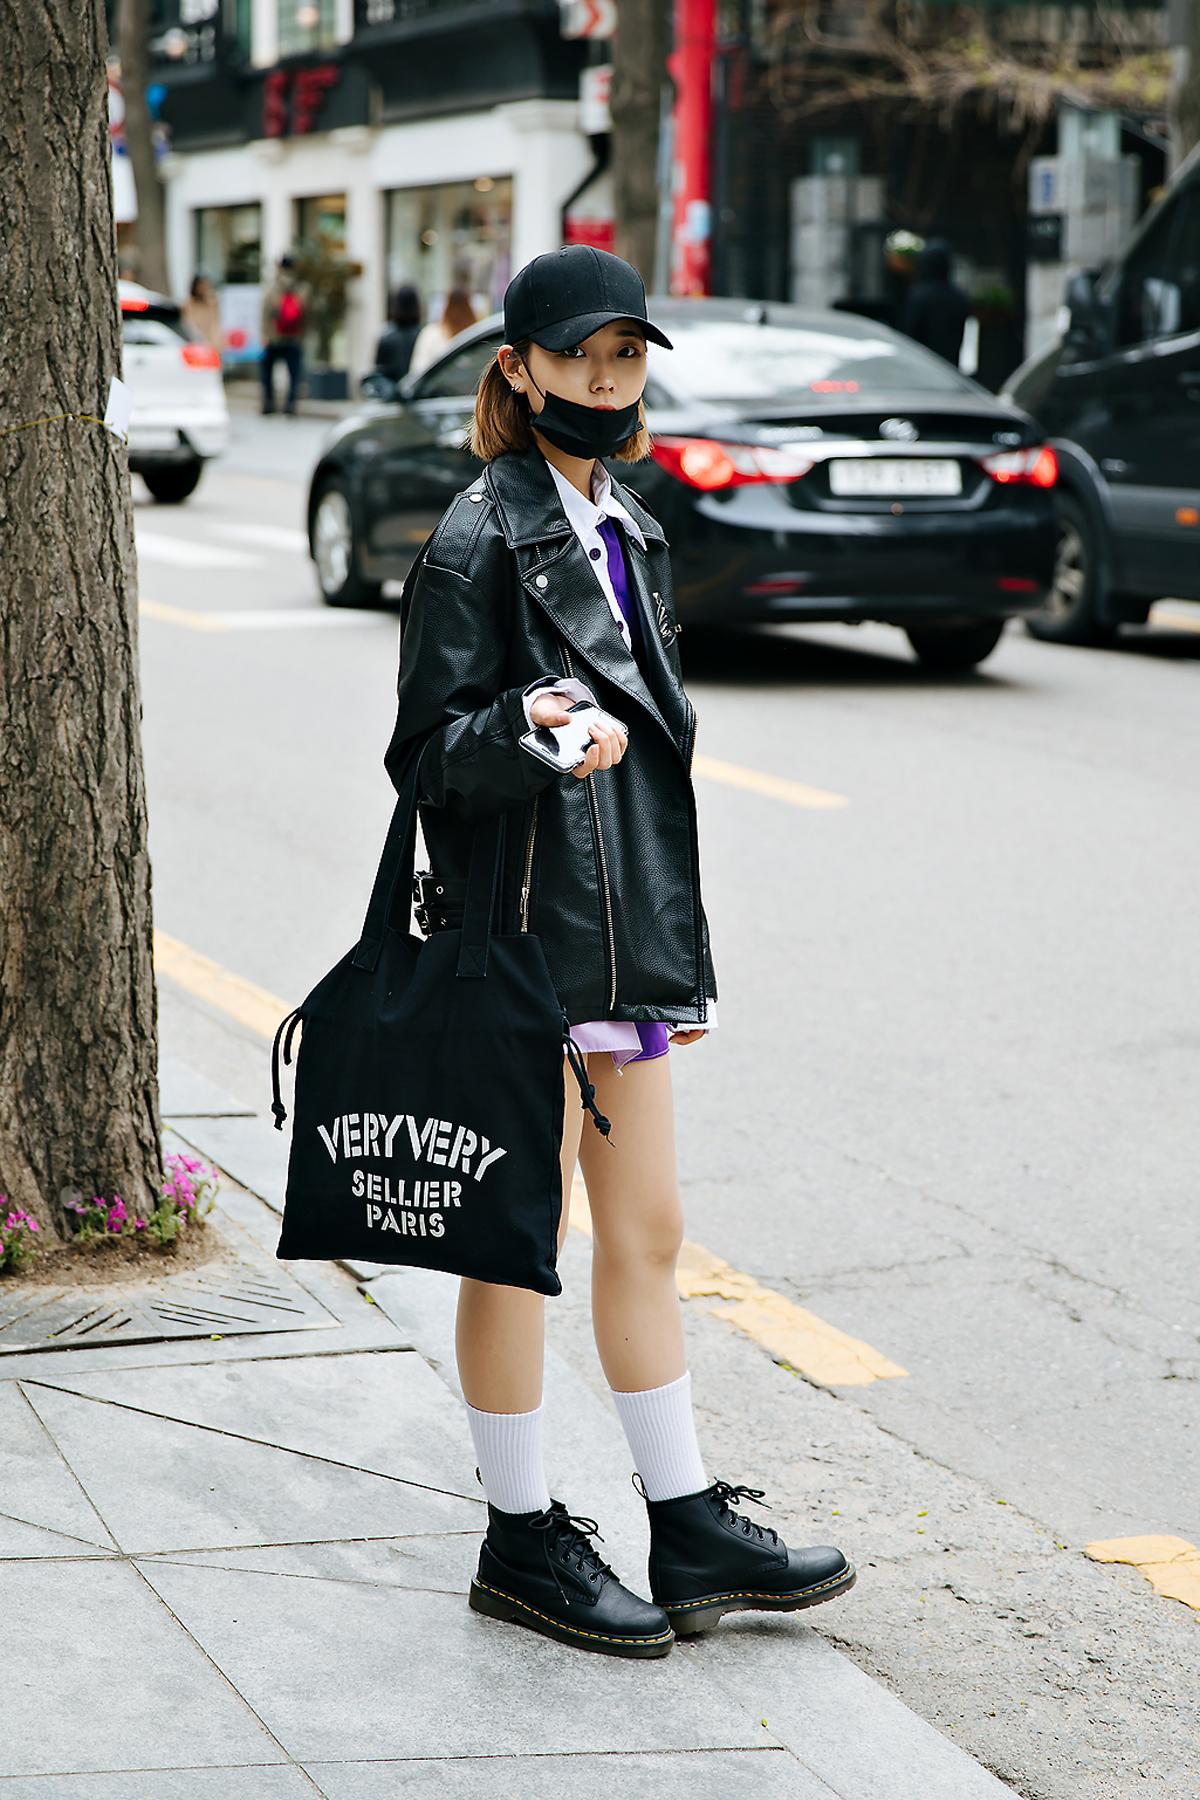 Jung Jaesun, Street style women spring 2018 in seoul